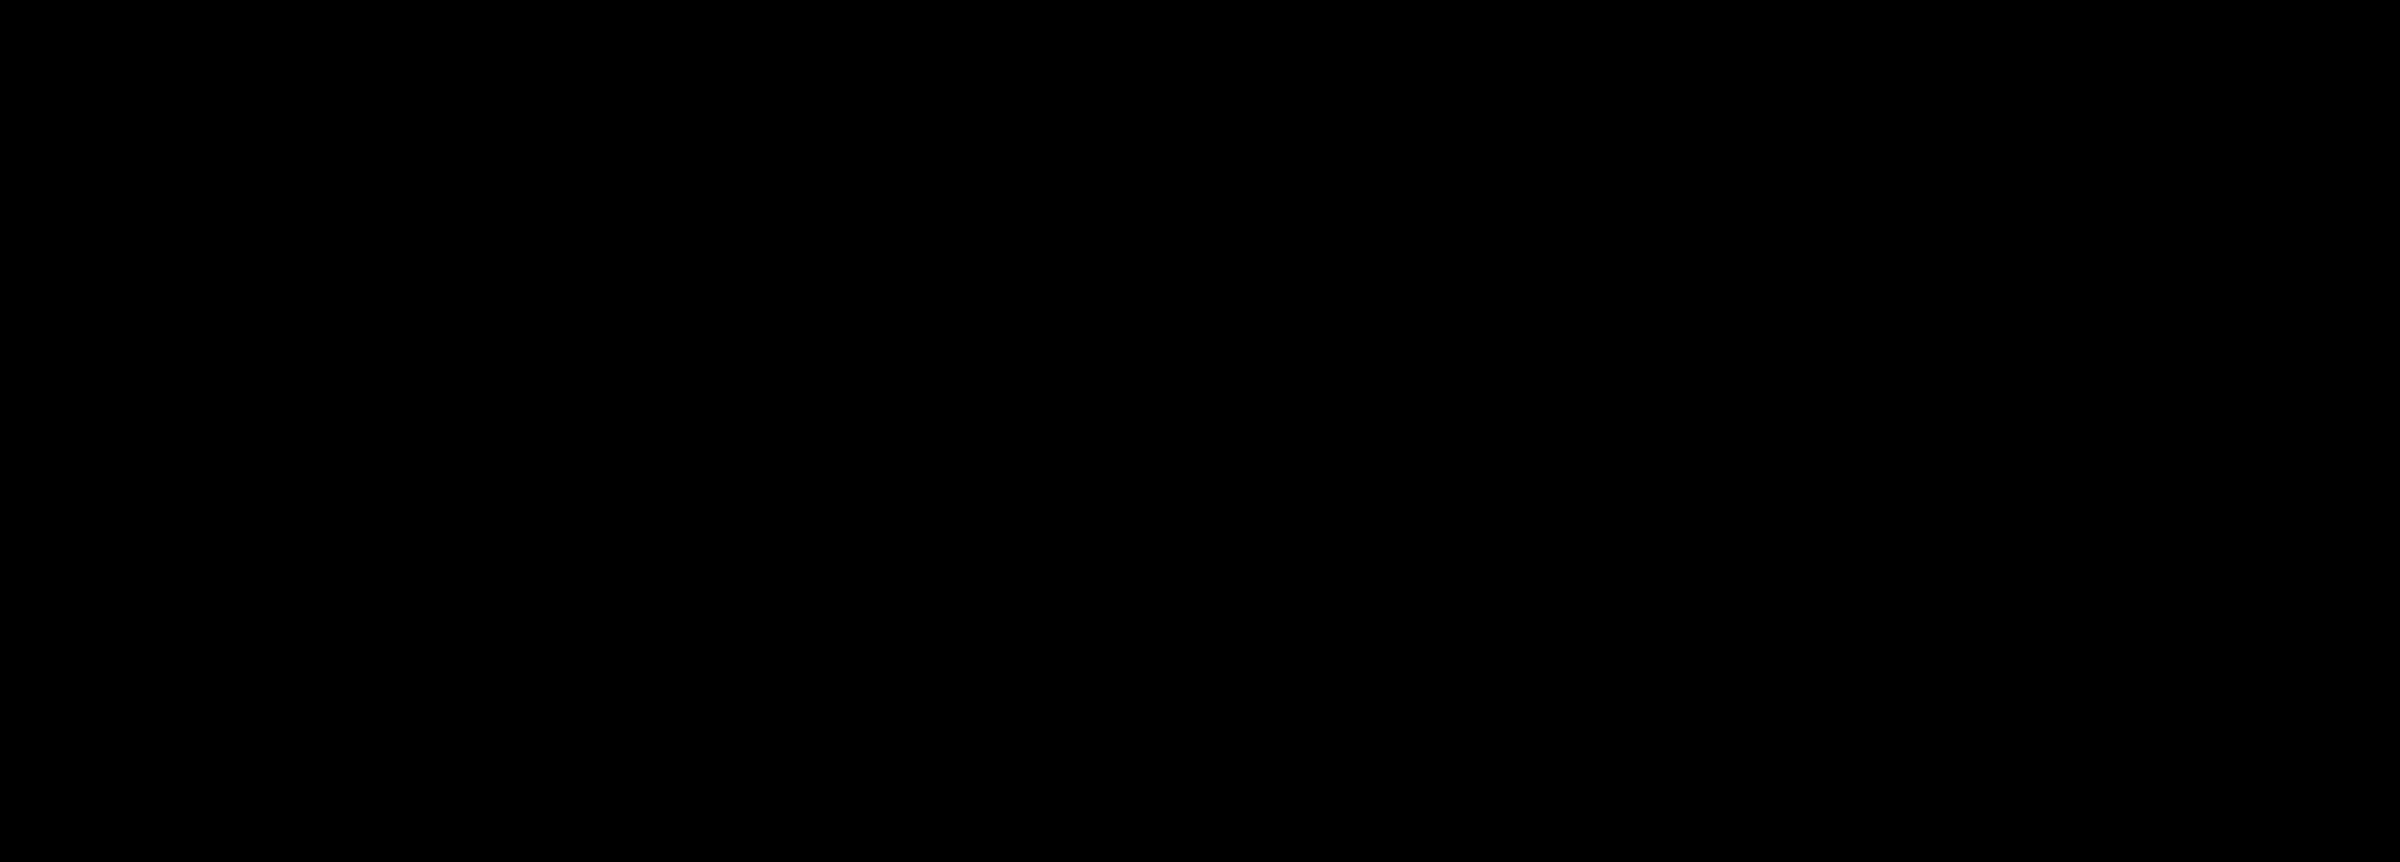 transamerica-4-logo-black-and-white